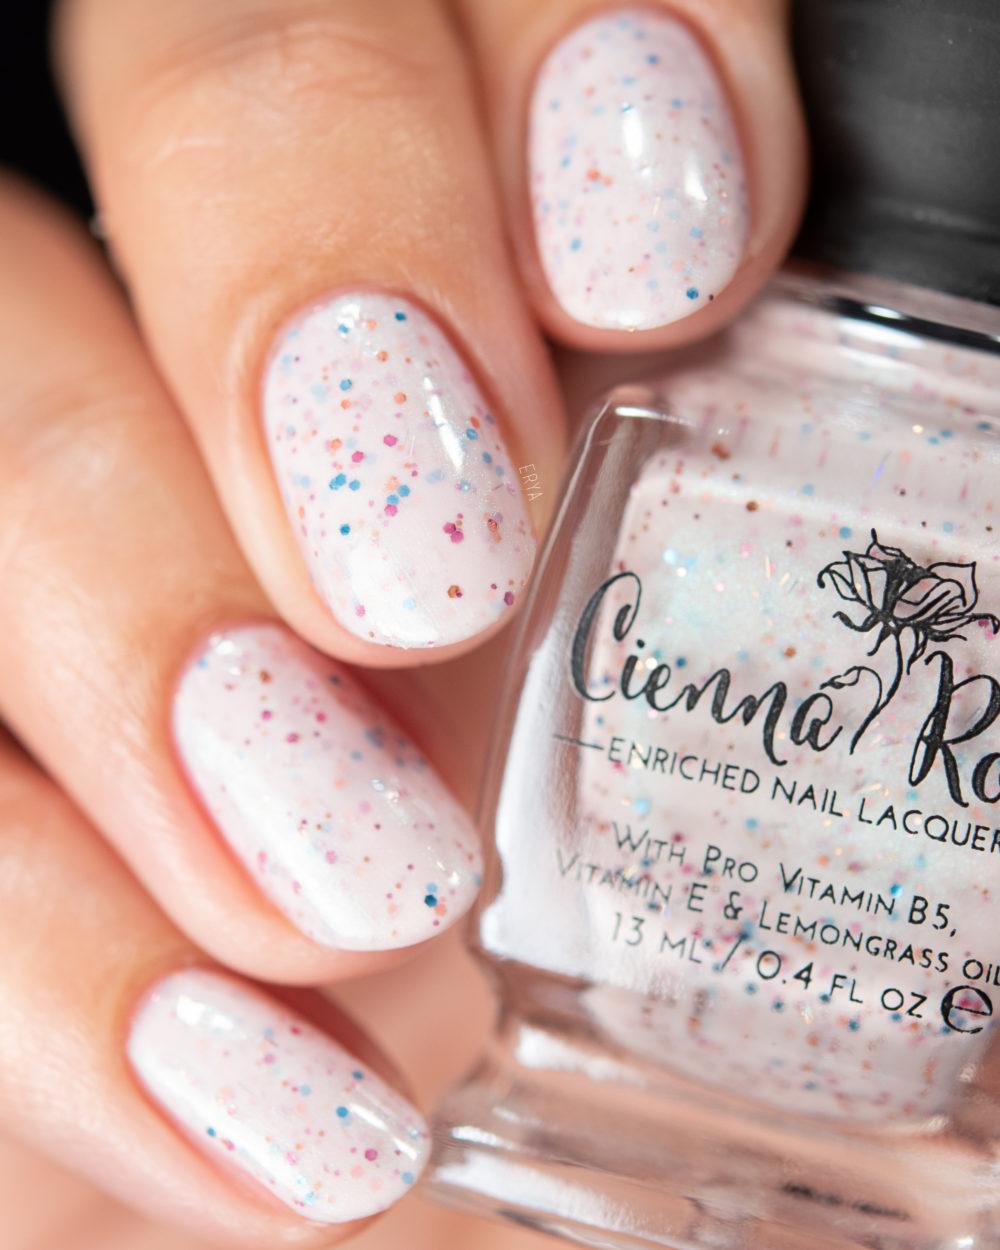 Cienna_Rose-Ice_Cream_Sundae-2